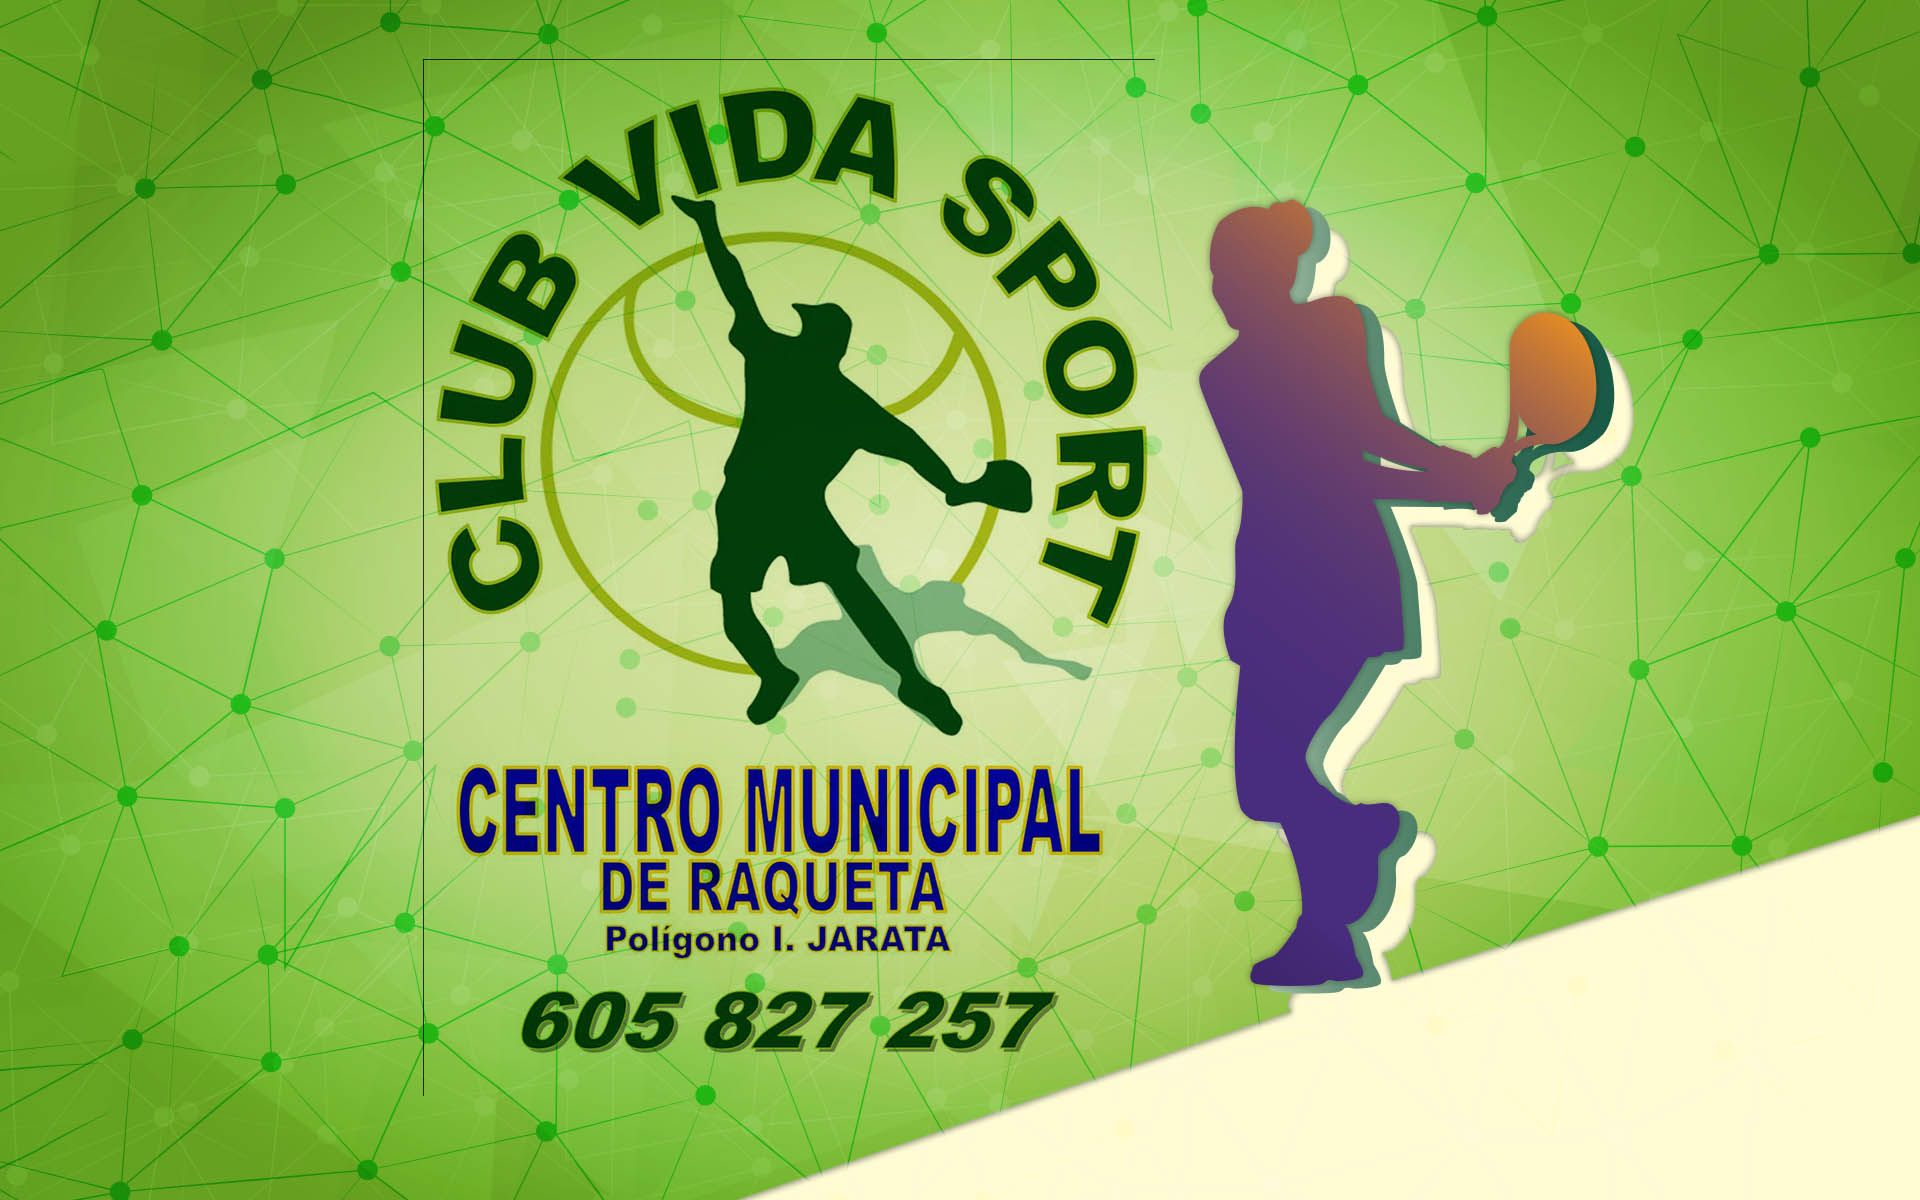 Club Vida Sport Centro MUNICIPAL de RAQUETA en Montilla